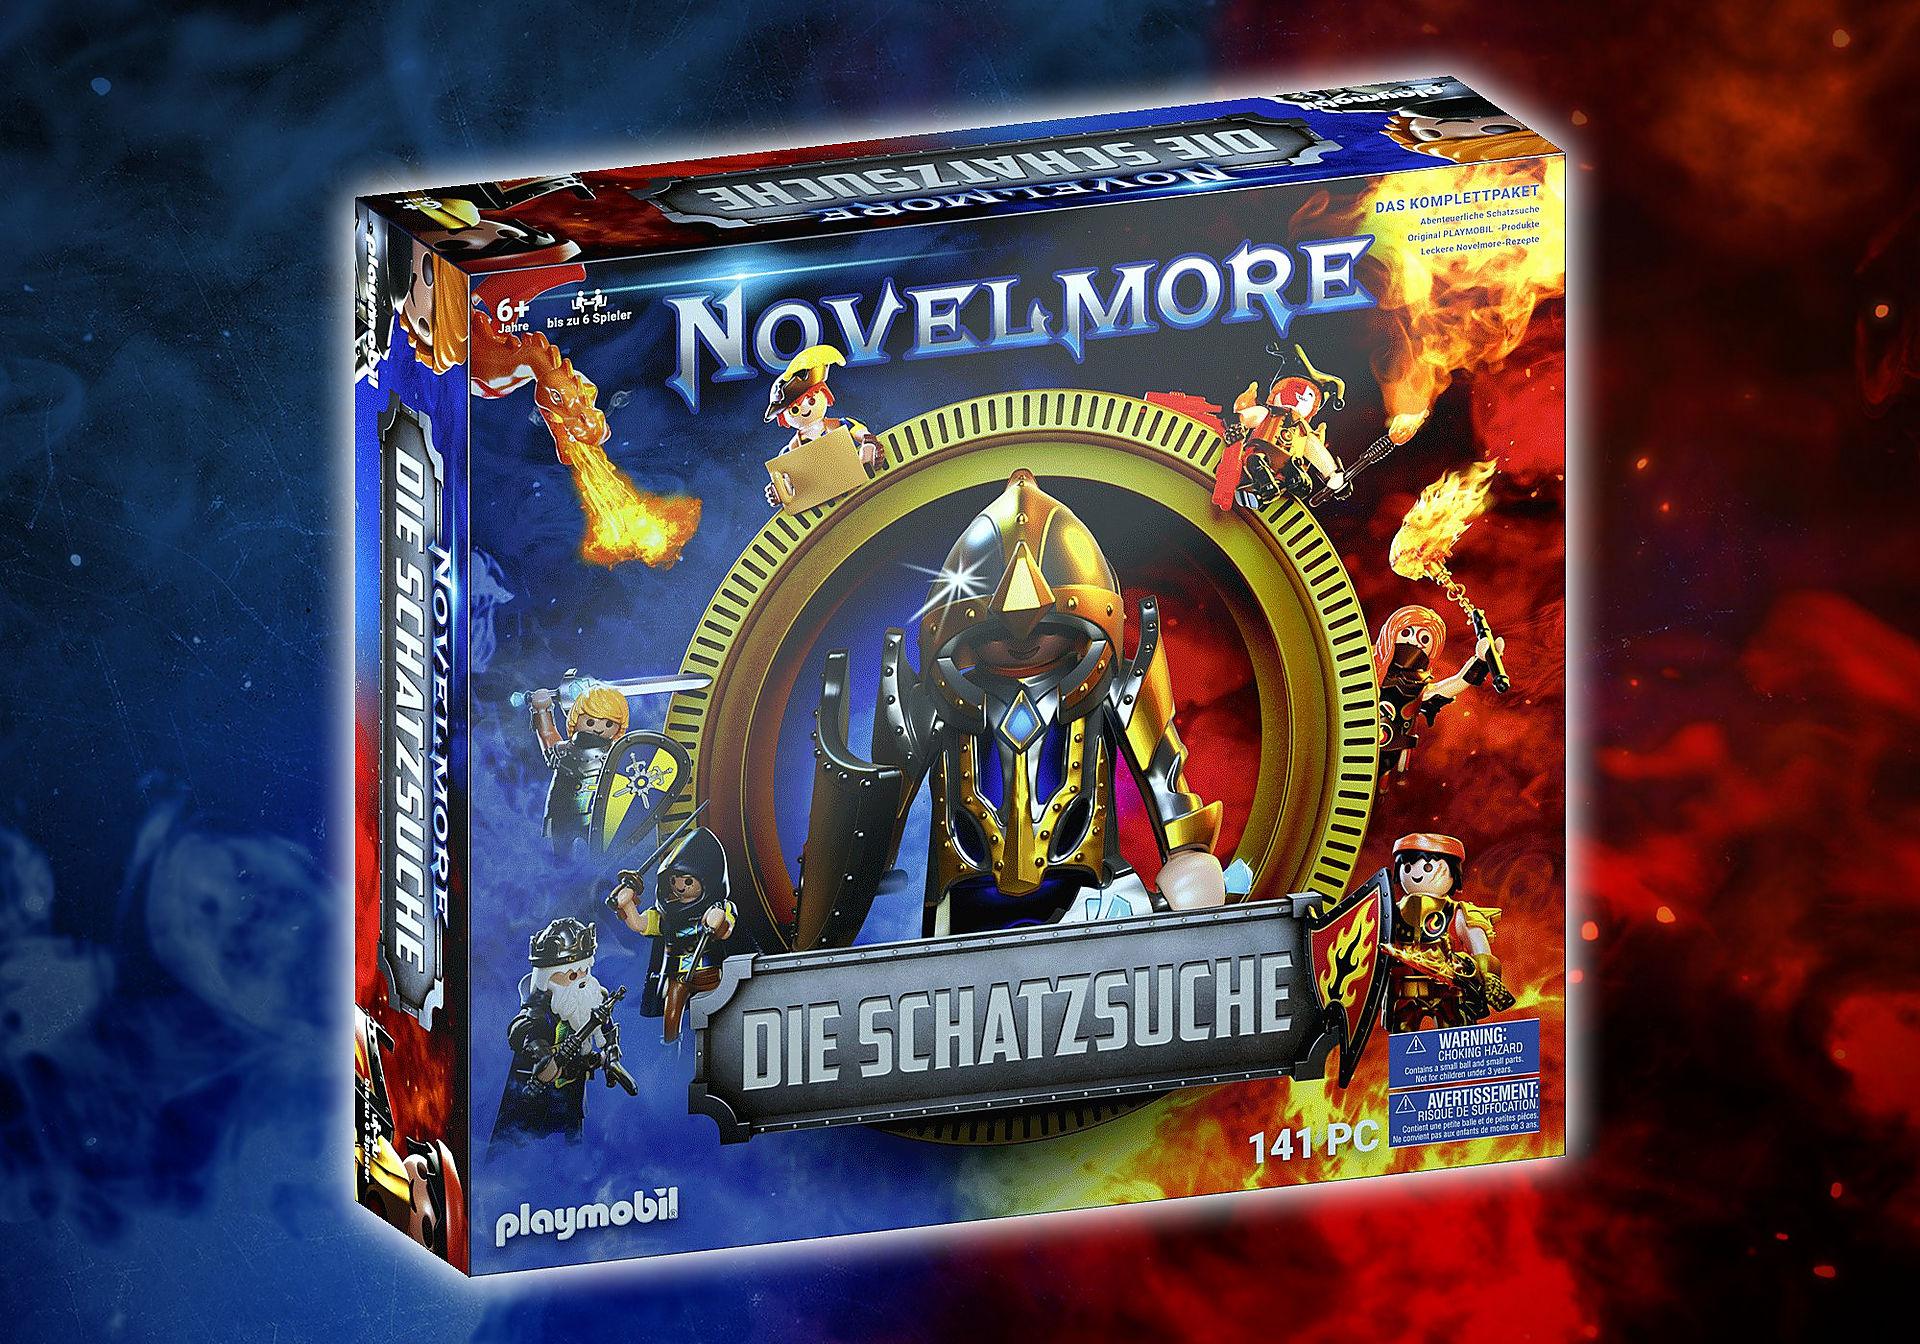 70736 PLAYMOBIL®Box: NOVELMORE Die Schatzsuche Das Familienevent zoom image1